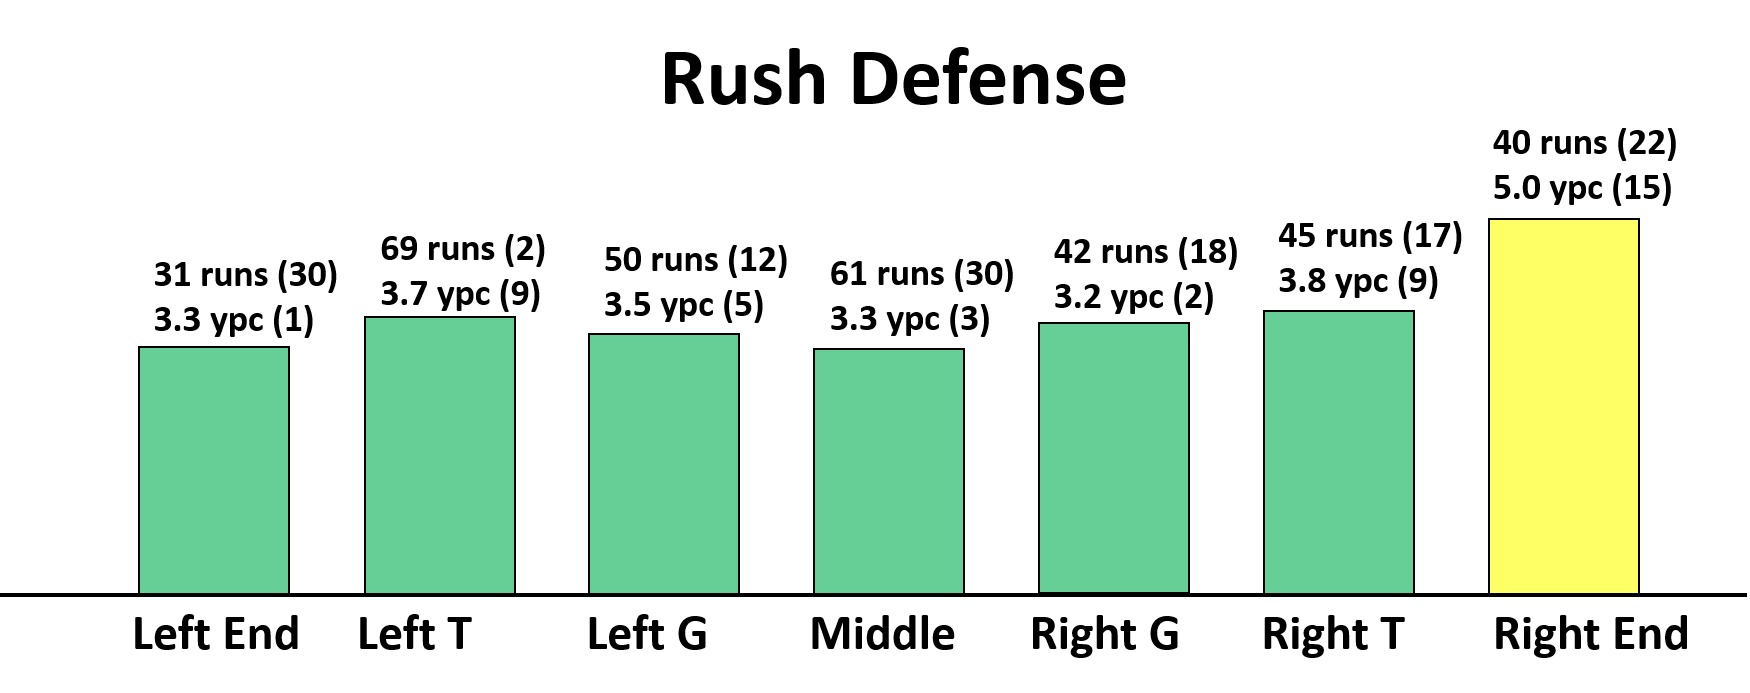 Da Bears Blog Self Scouting Chicago S 2018 Defense Run Pass Across The Field